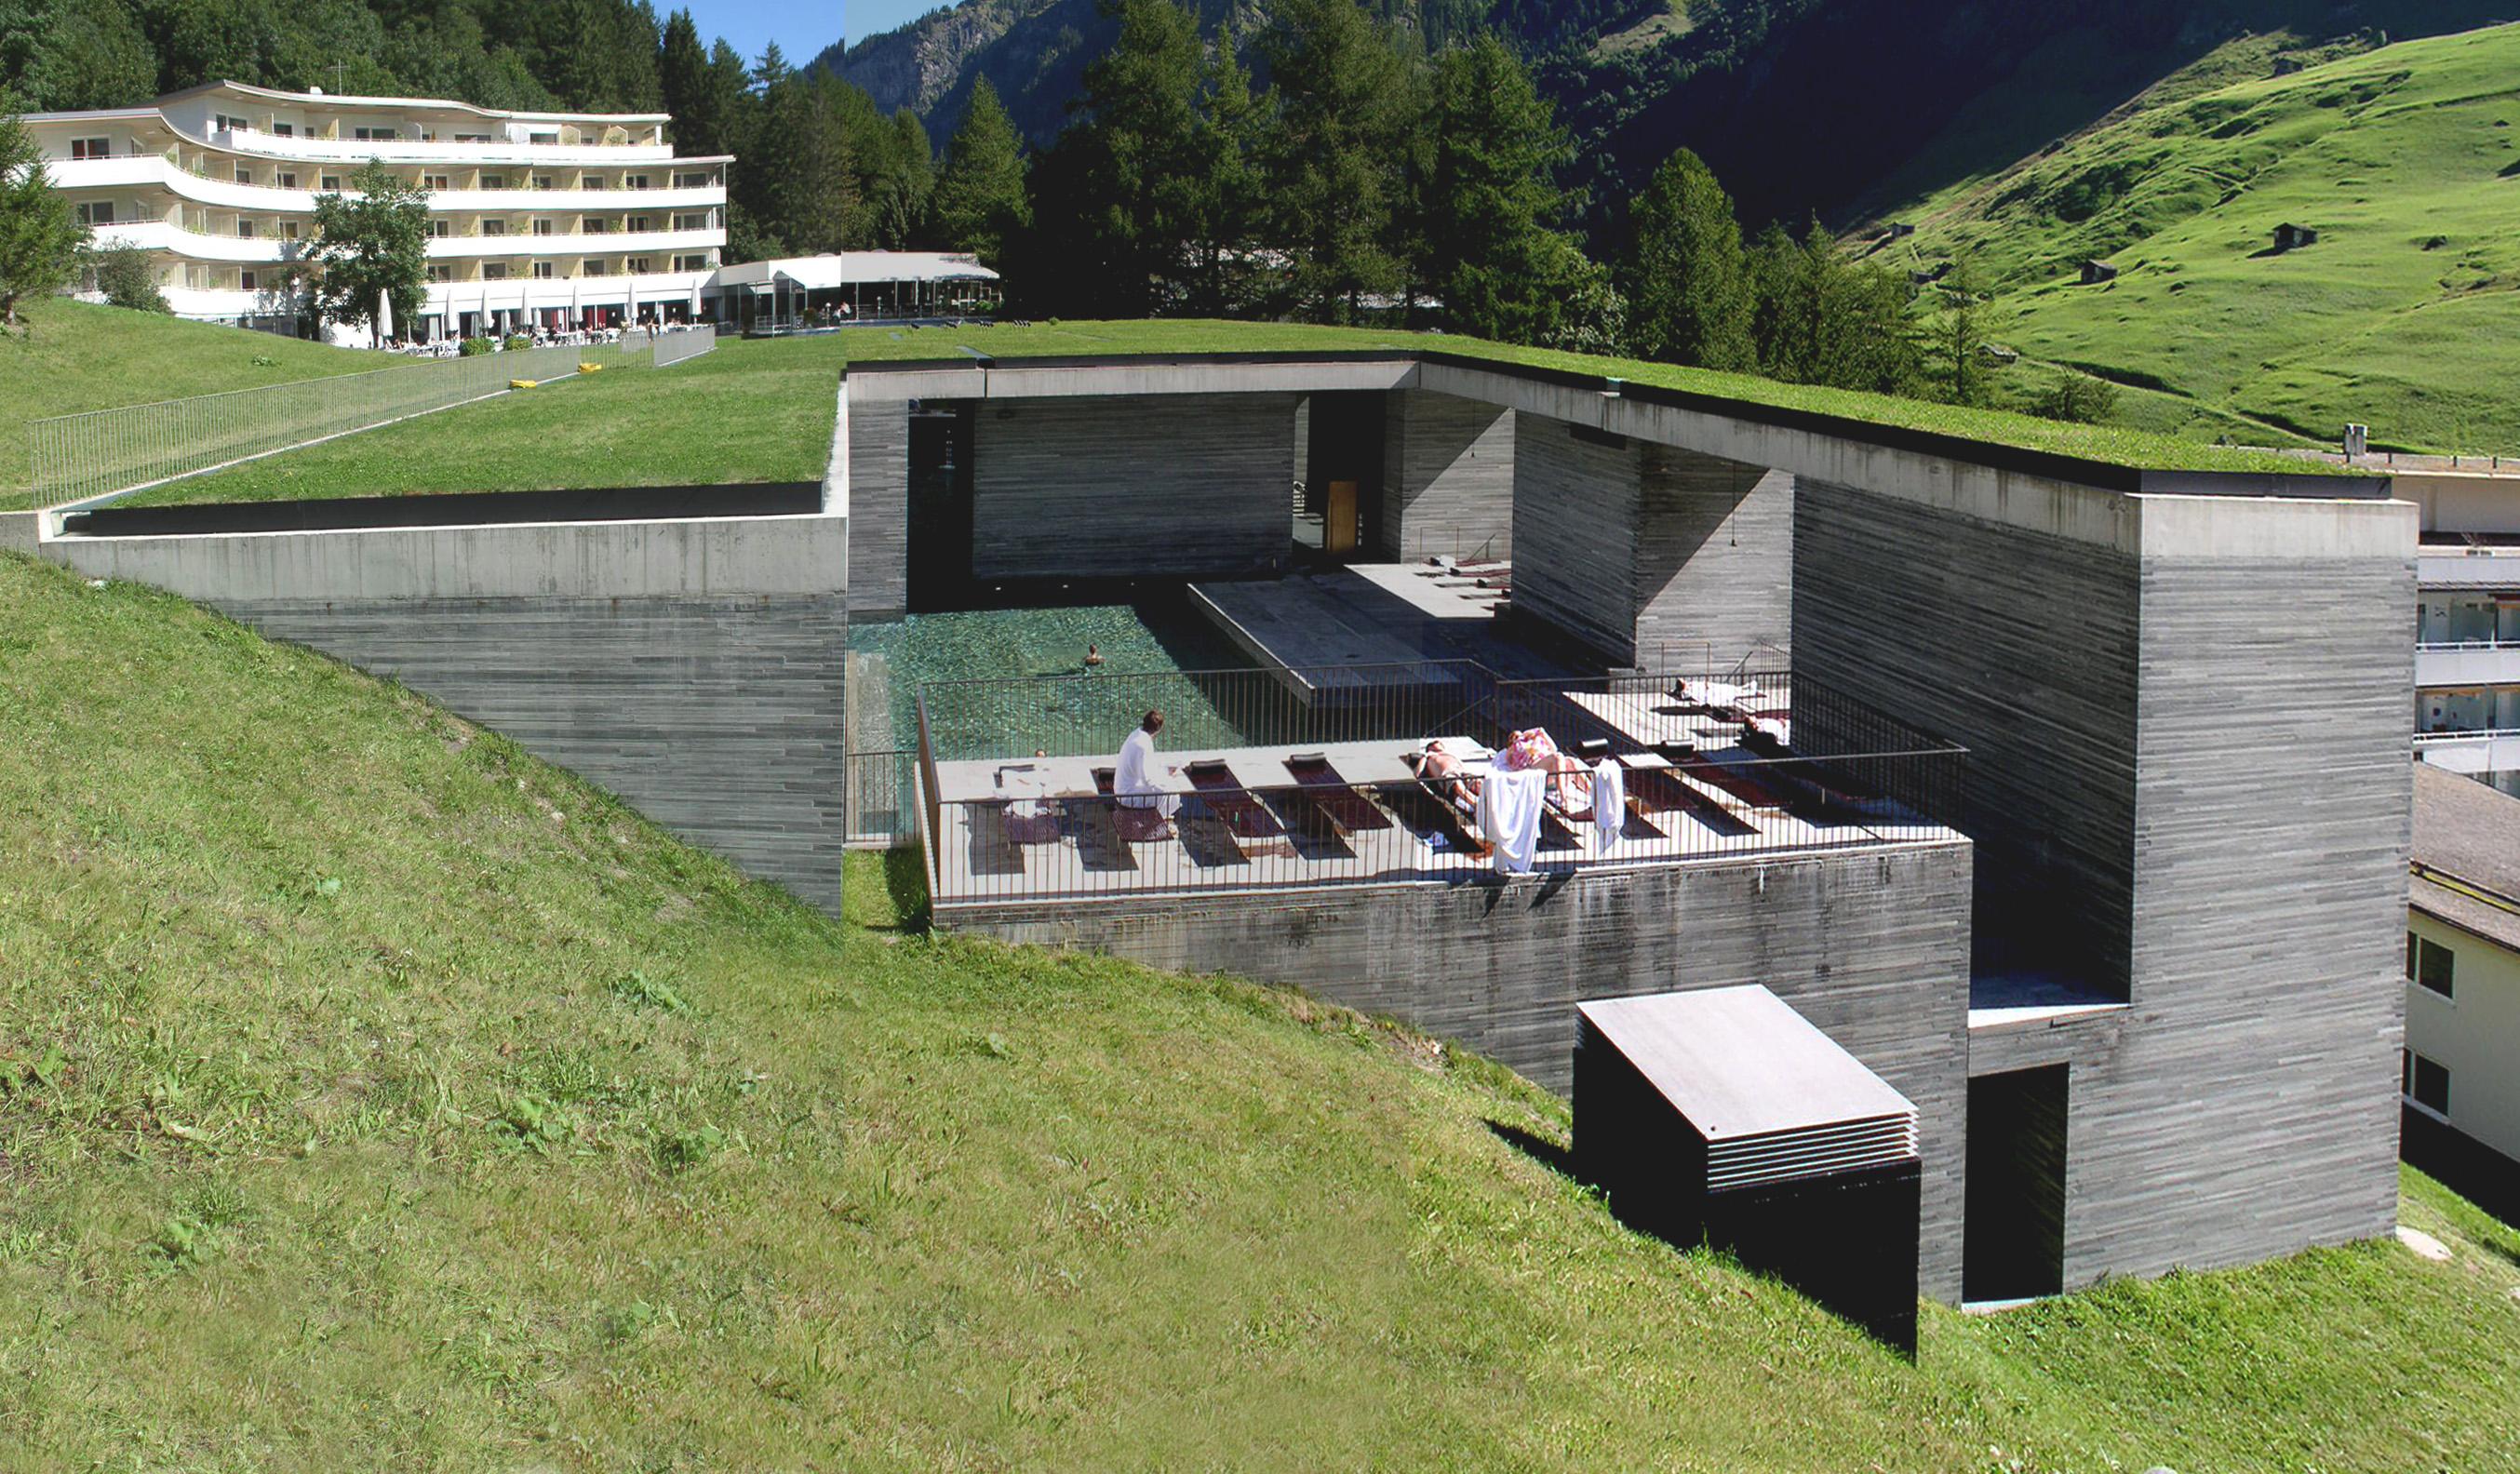 Hotel therme vals peter zumthor arkhitekton for Design hotel vals